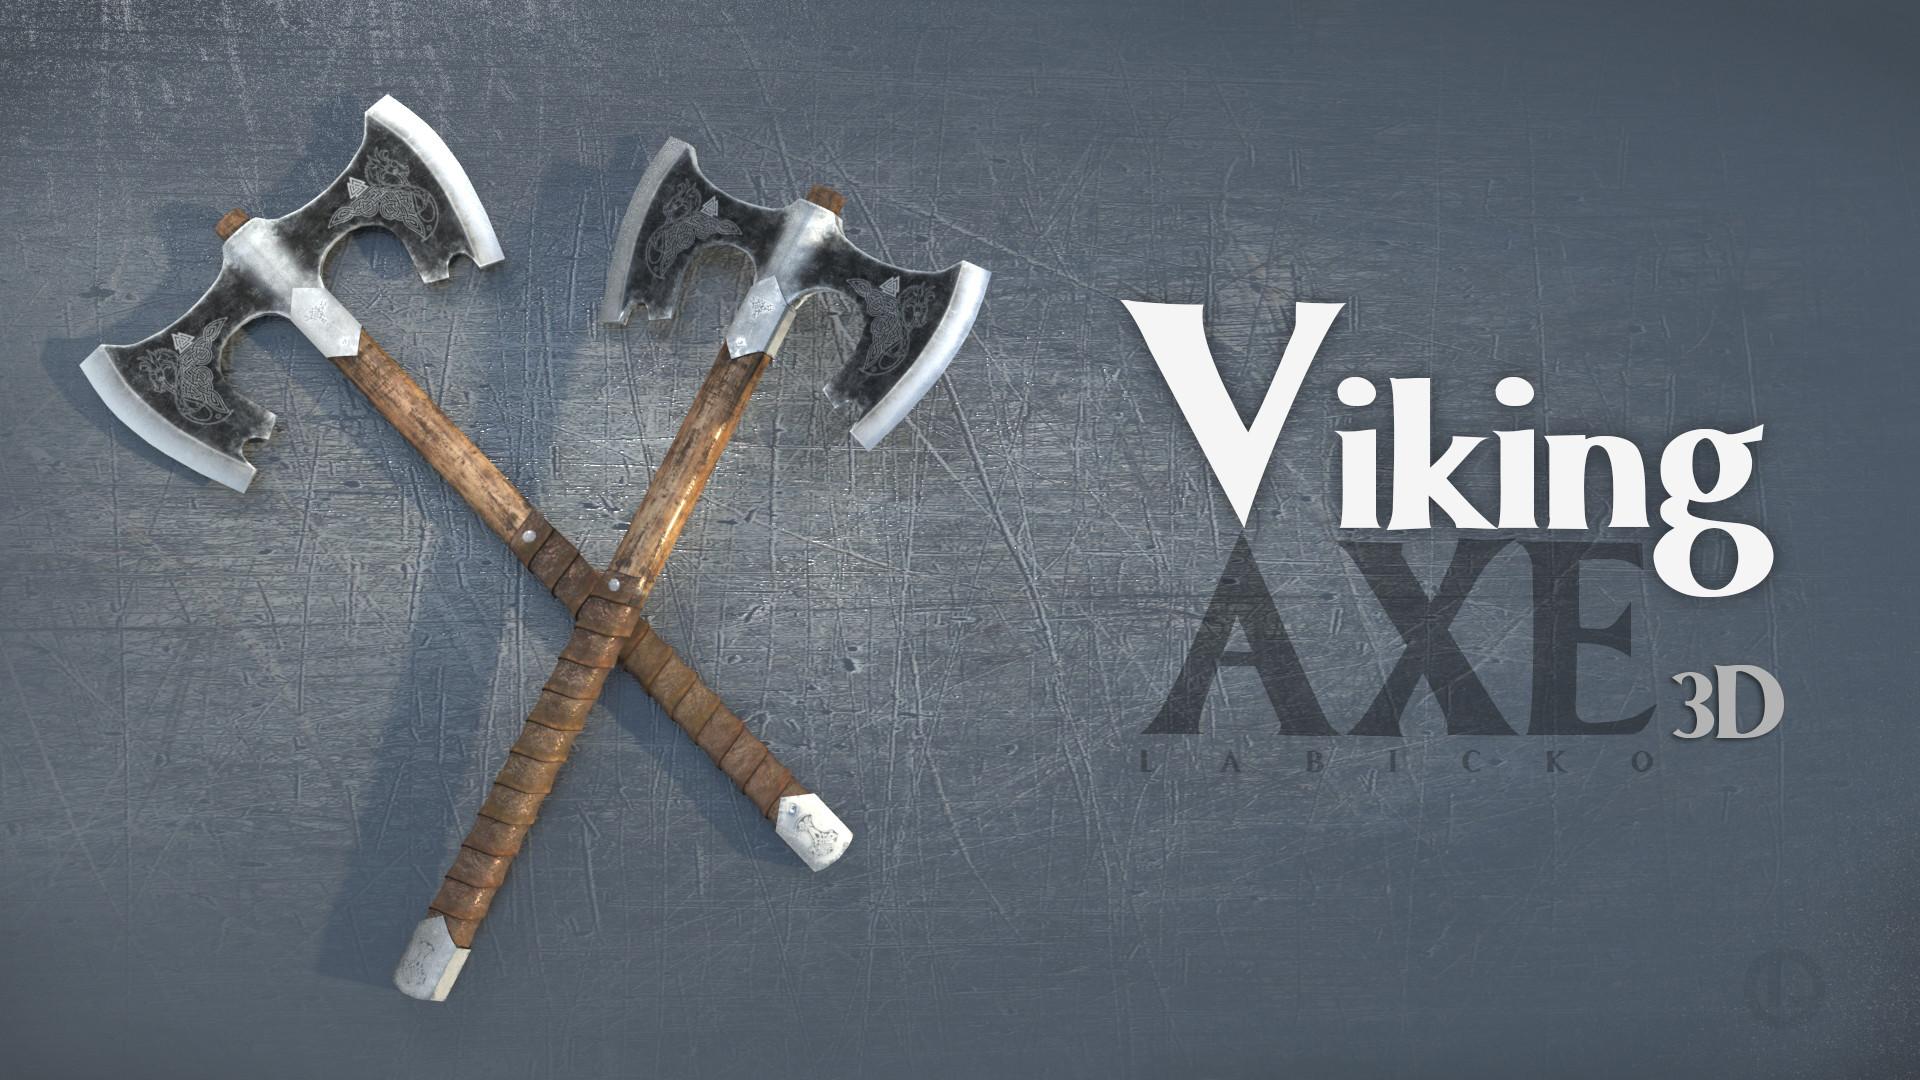 dejan-labicic-3d-viking-axe-2.jpg